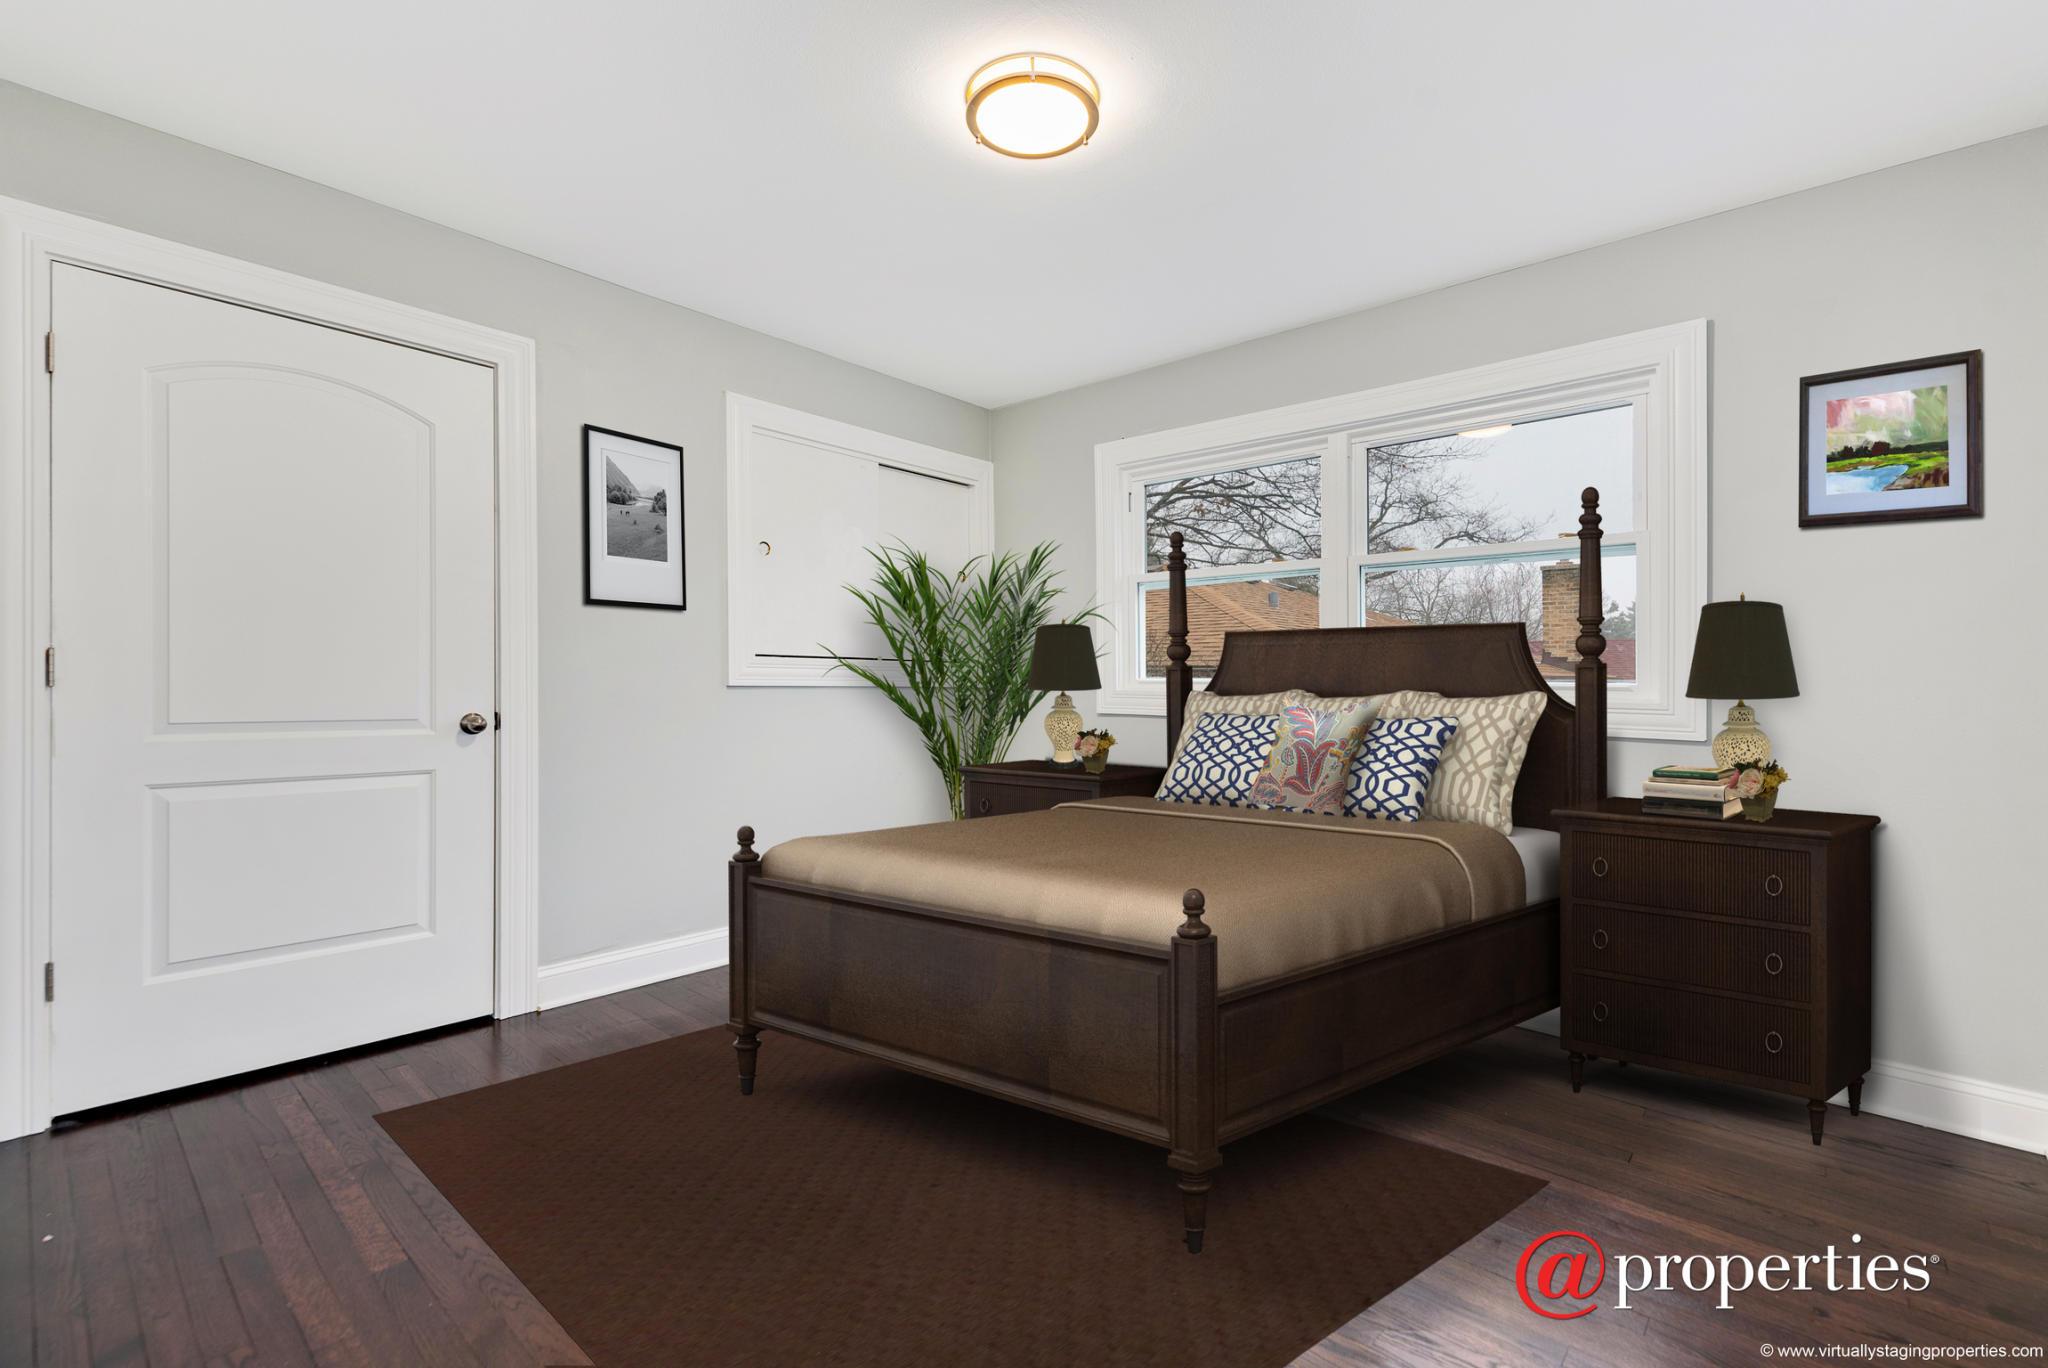 Howard St Skokie IL Estimate And Home Details Trulia - Bathroom remodeling skokie il